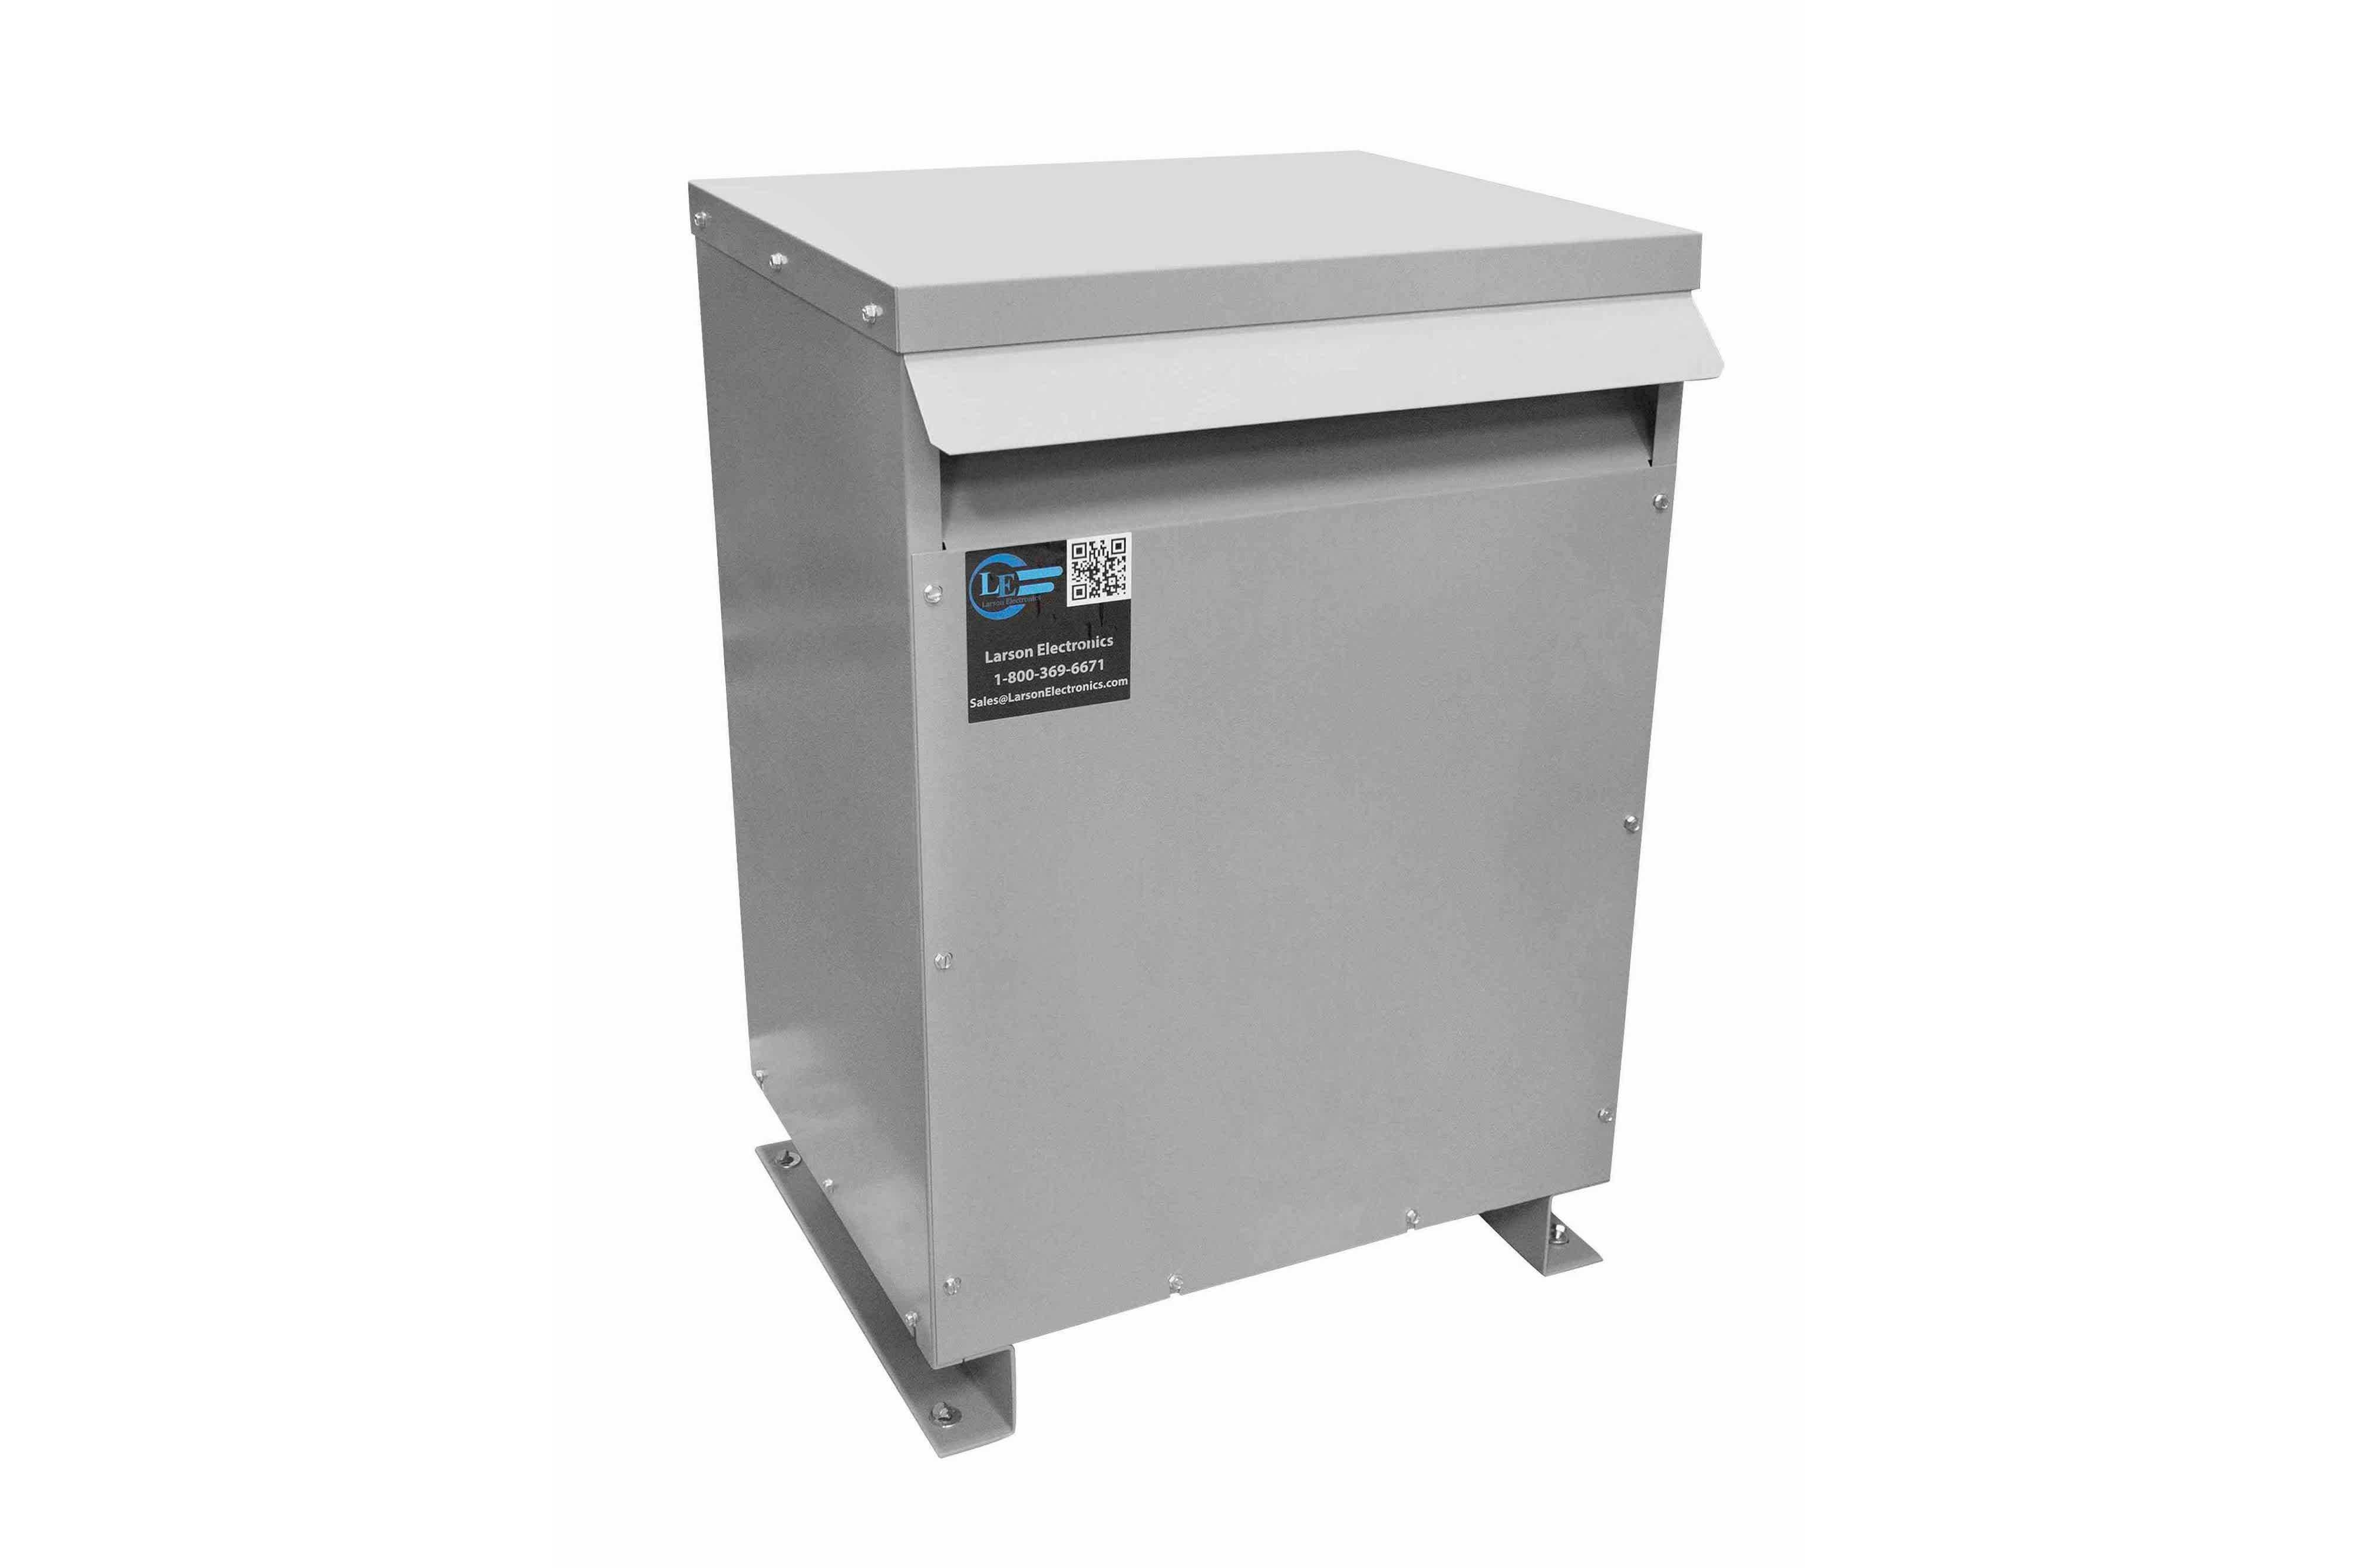 70 kVA 3PH Isolation Transformer, 600V Wye Primary, 380V Delta Secondary, N3R, Ventilated, 60 Hz